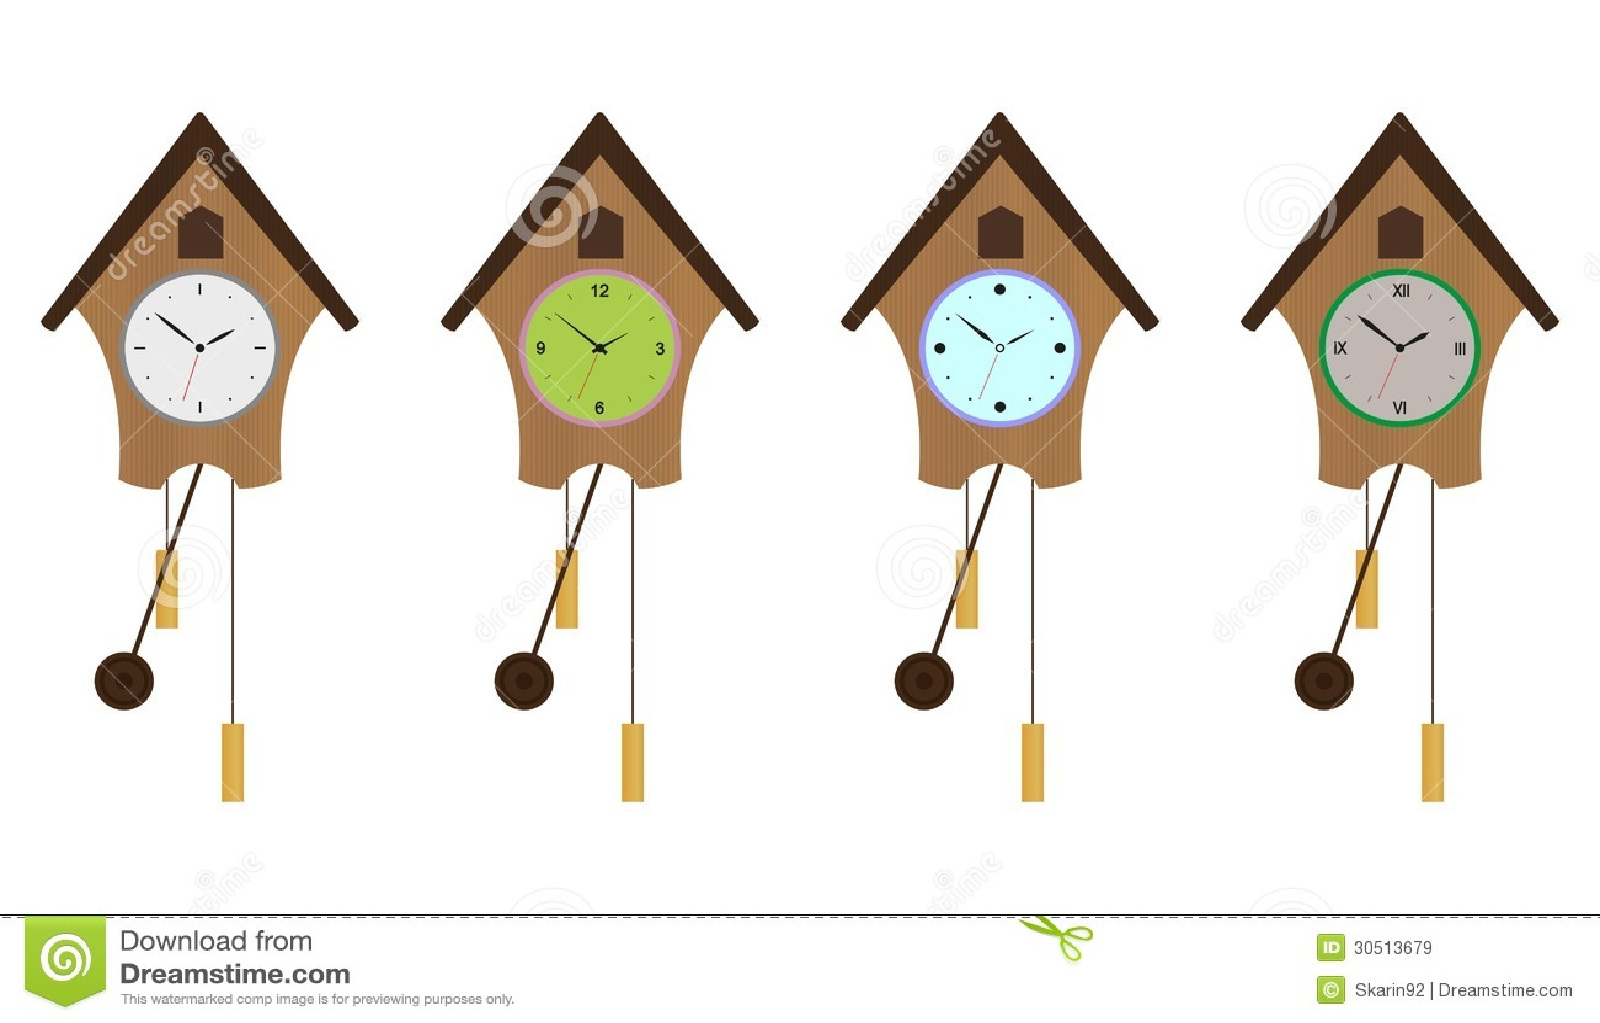 cuckoo clock clip art free - photo #36